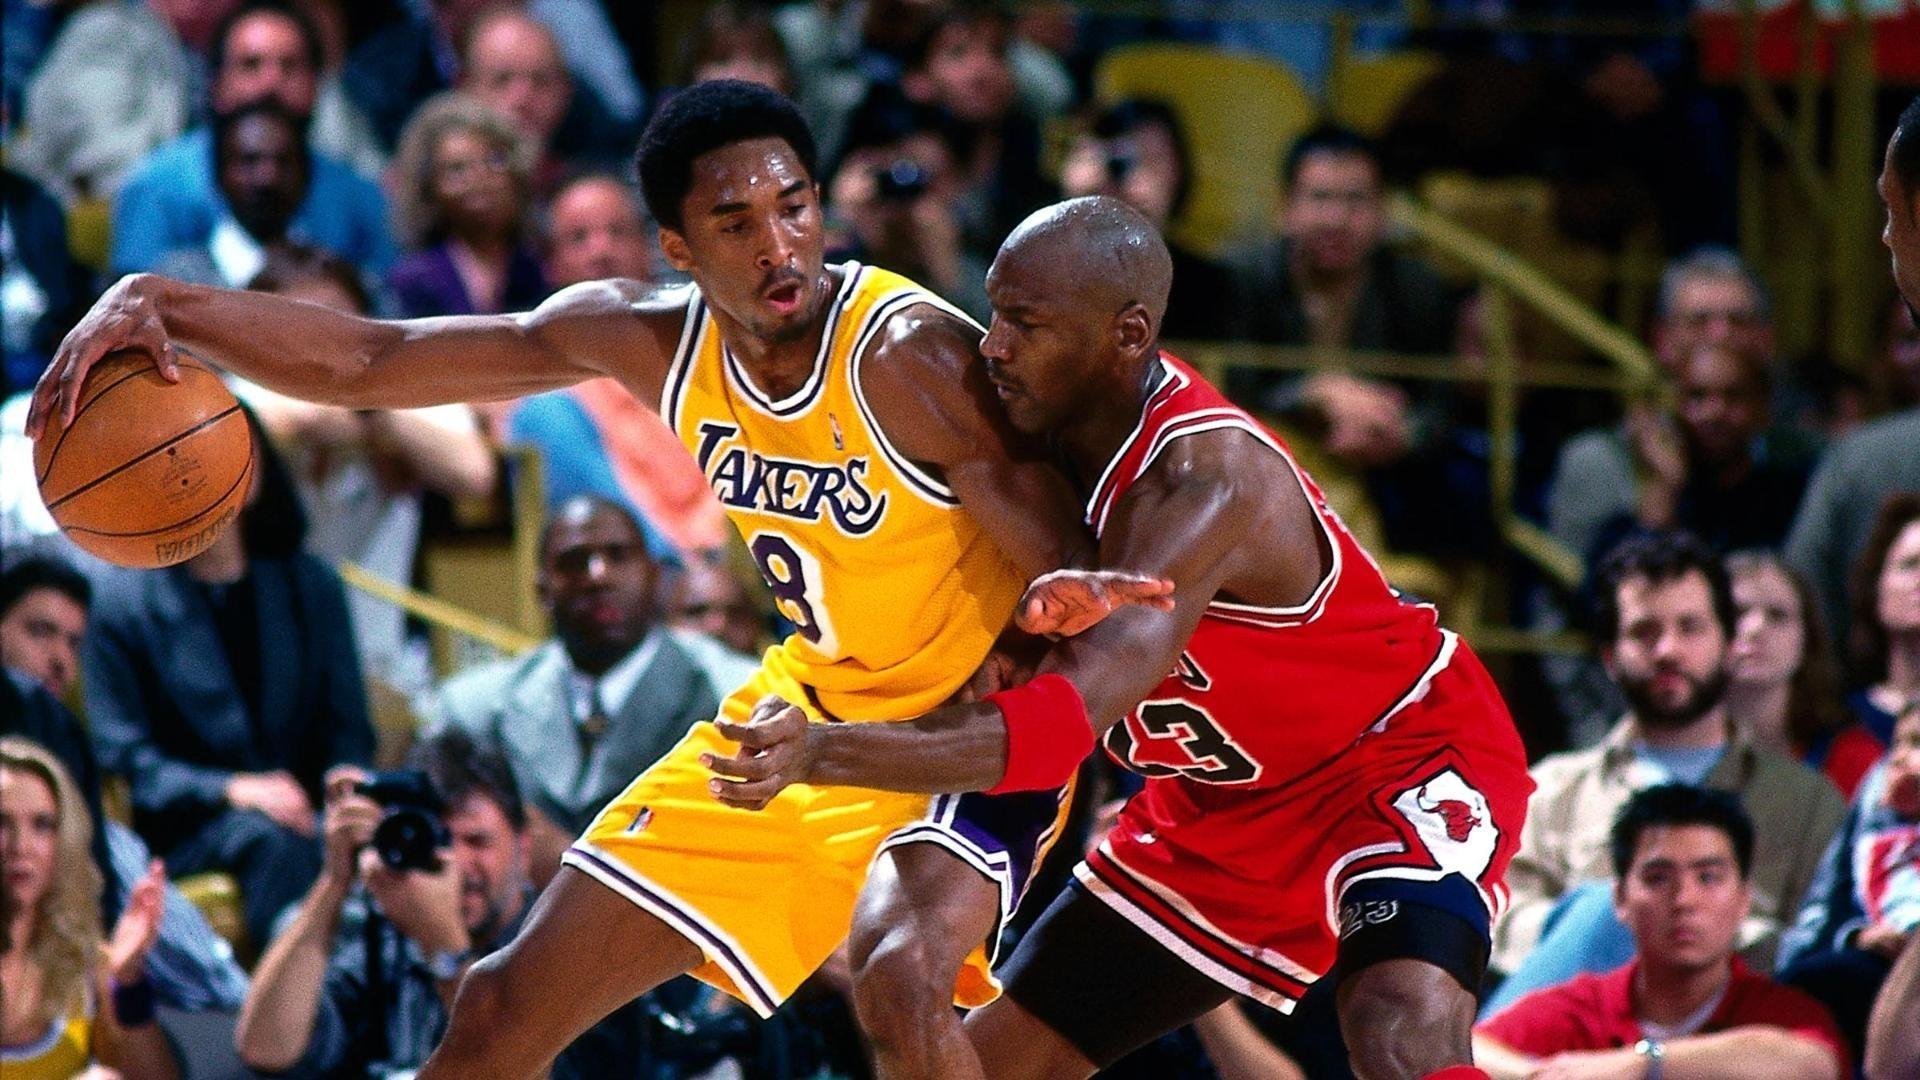 Michael Jordan Wallpaper 1080p: Michael Jordan Wallpaper 1920x1080 (74+ Images